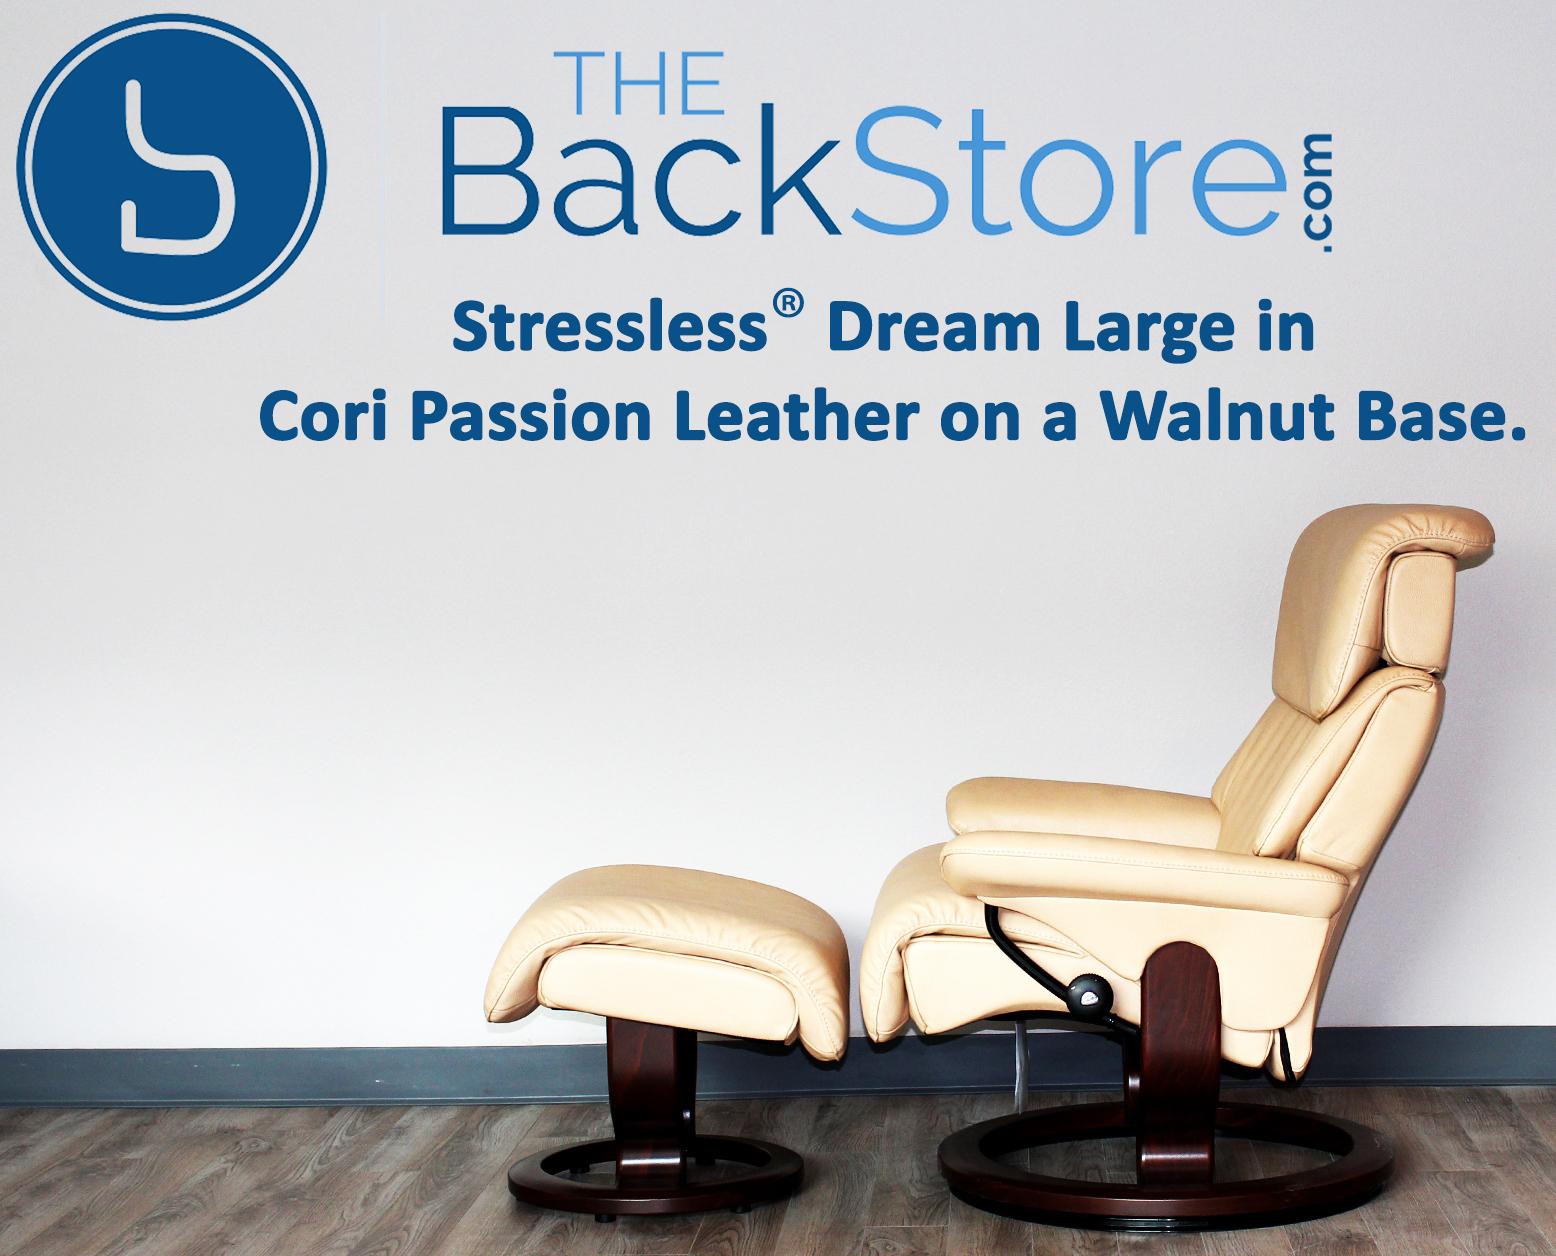 Stressless Dream Medium Cori Passion Leather by Ekornes